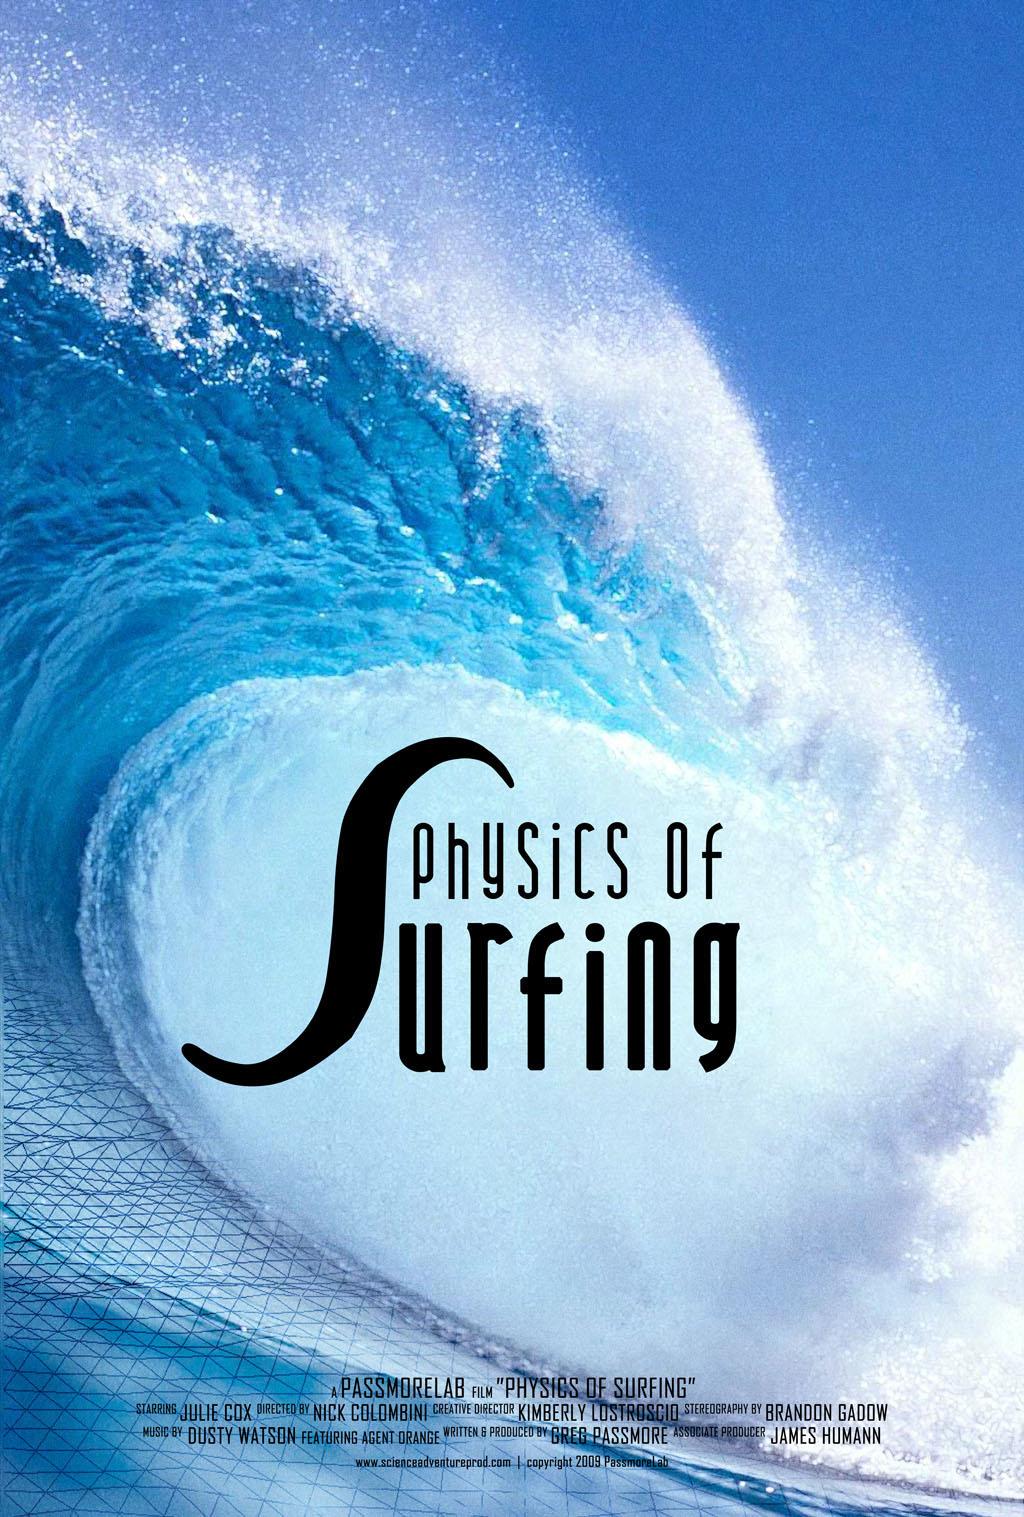 physicsofsurfing_poster-2.jpg